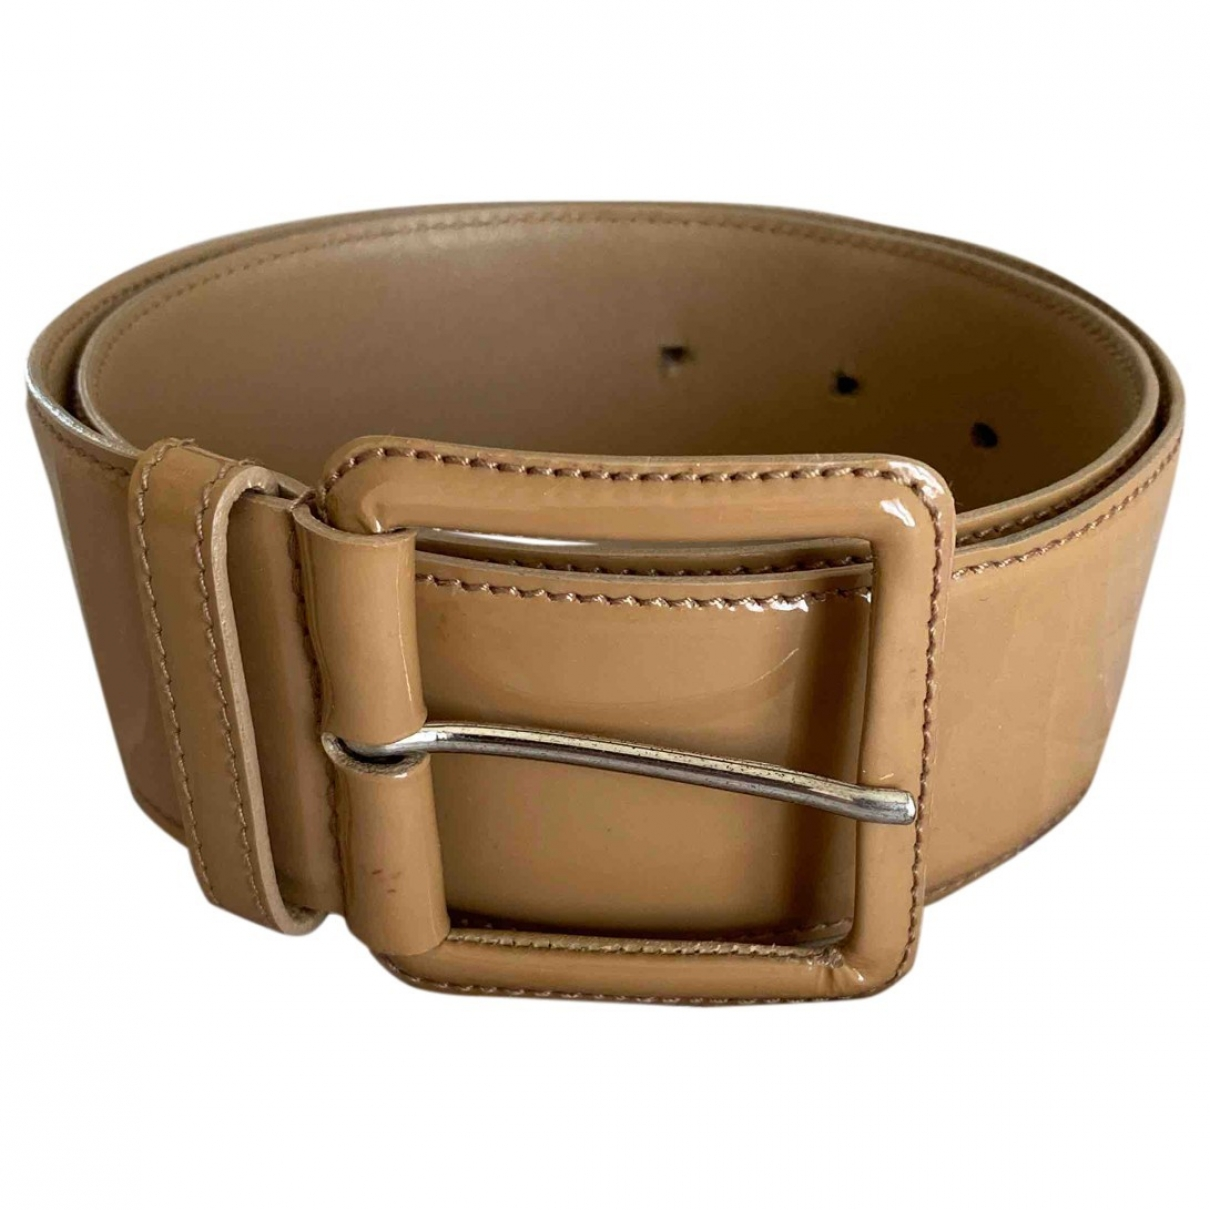 Miu Miu \N Camel Patent leather belt for Women 75 cm